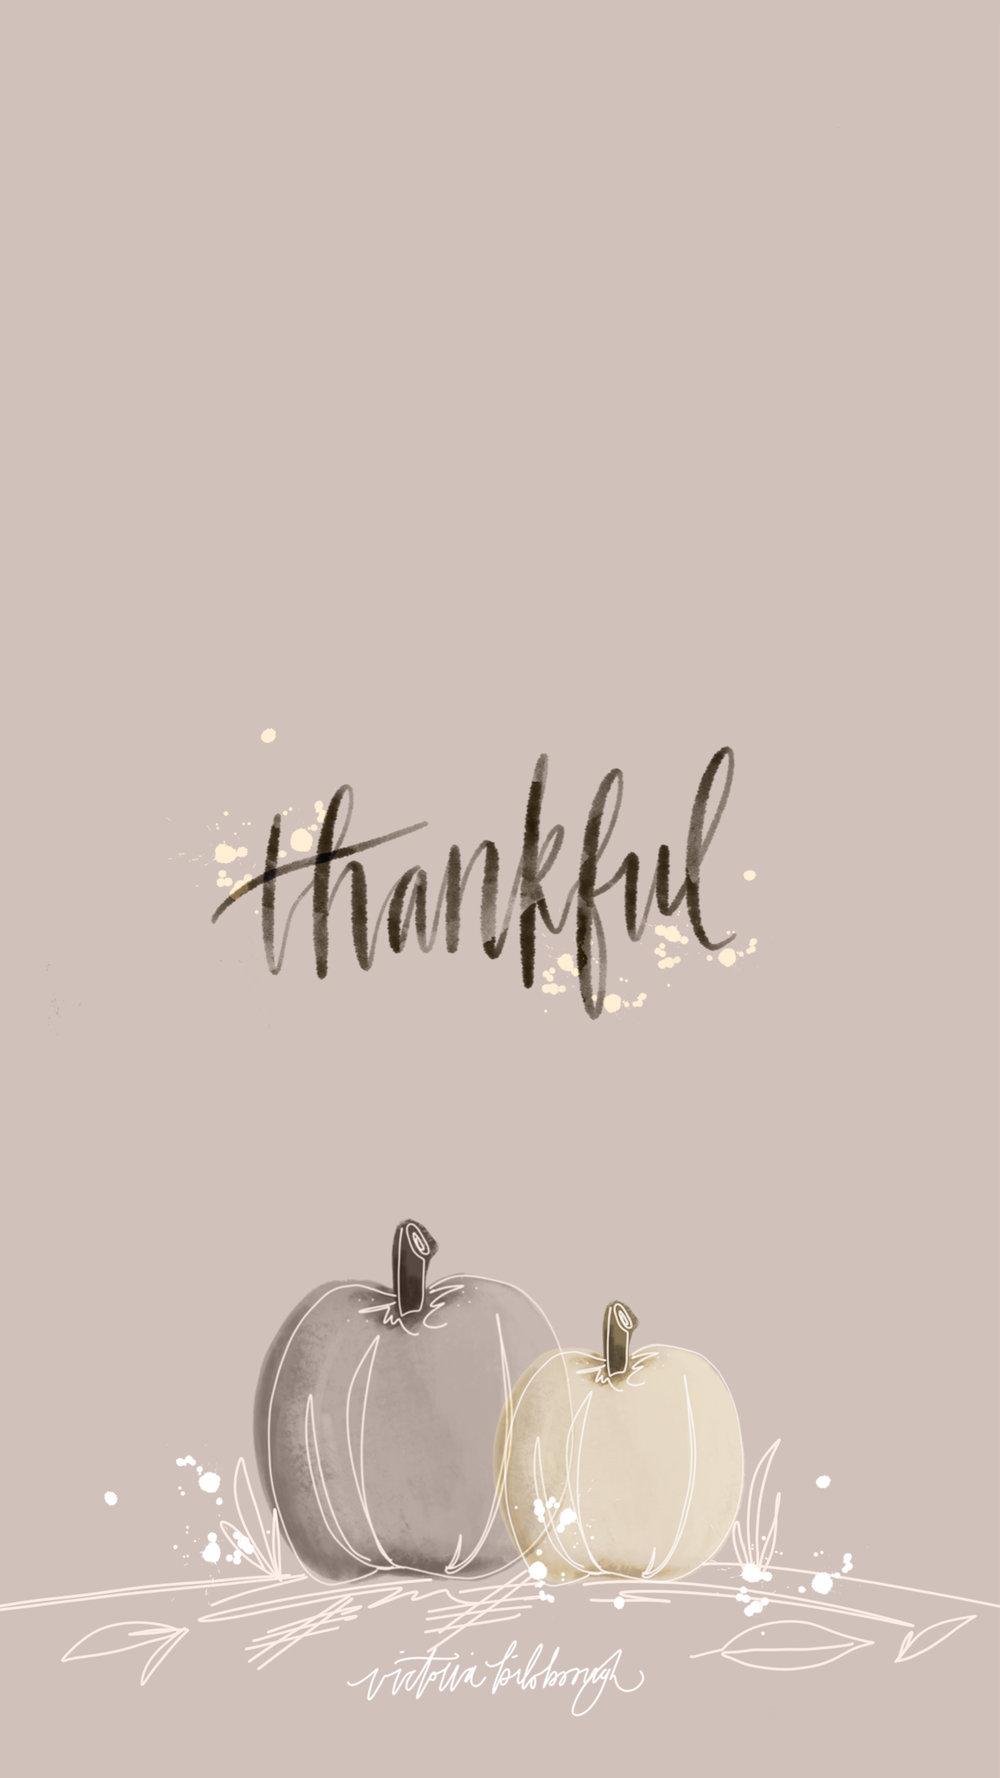 download Thanksgiving Wallpapers Phone Desktop Victoria 1000x1778